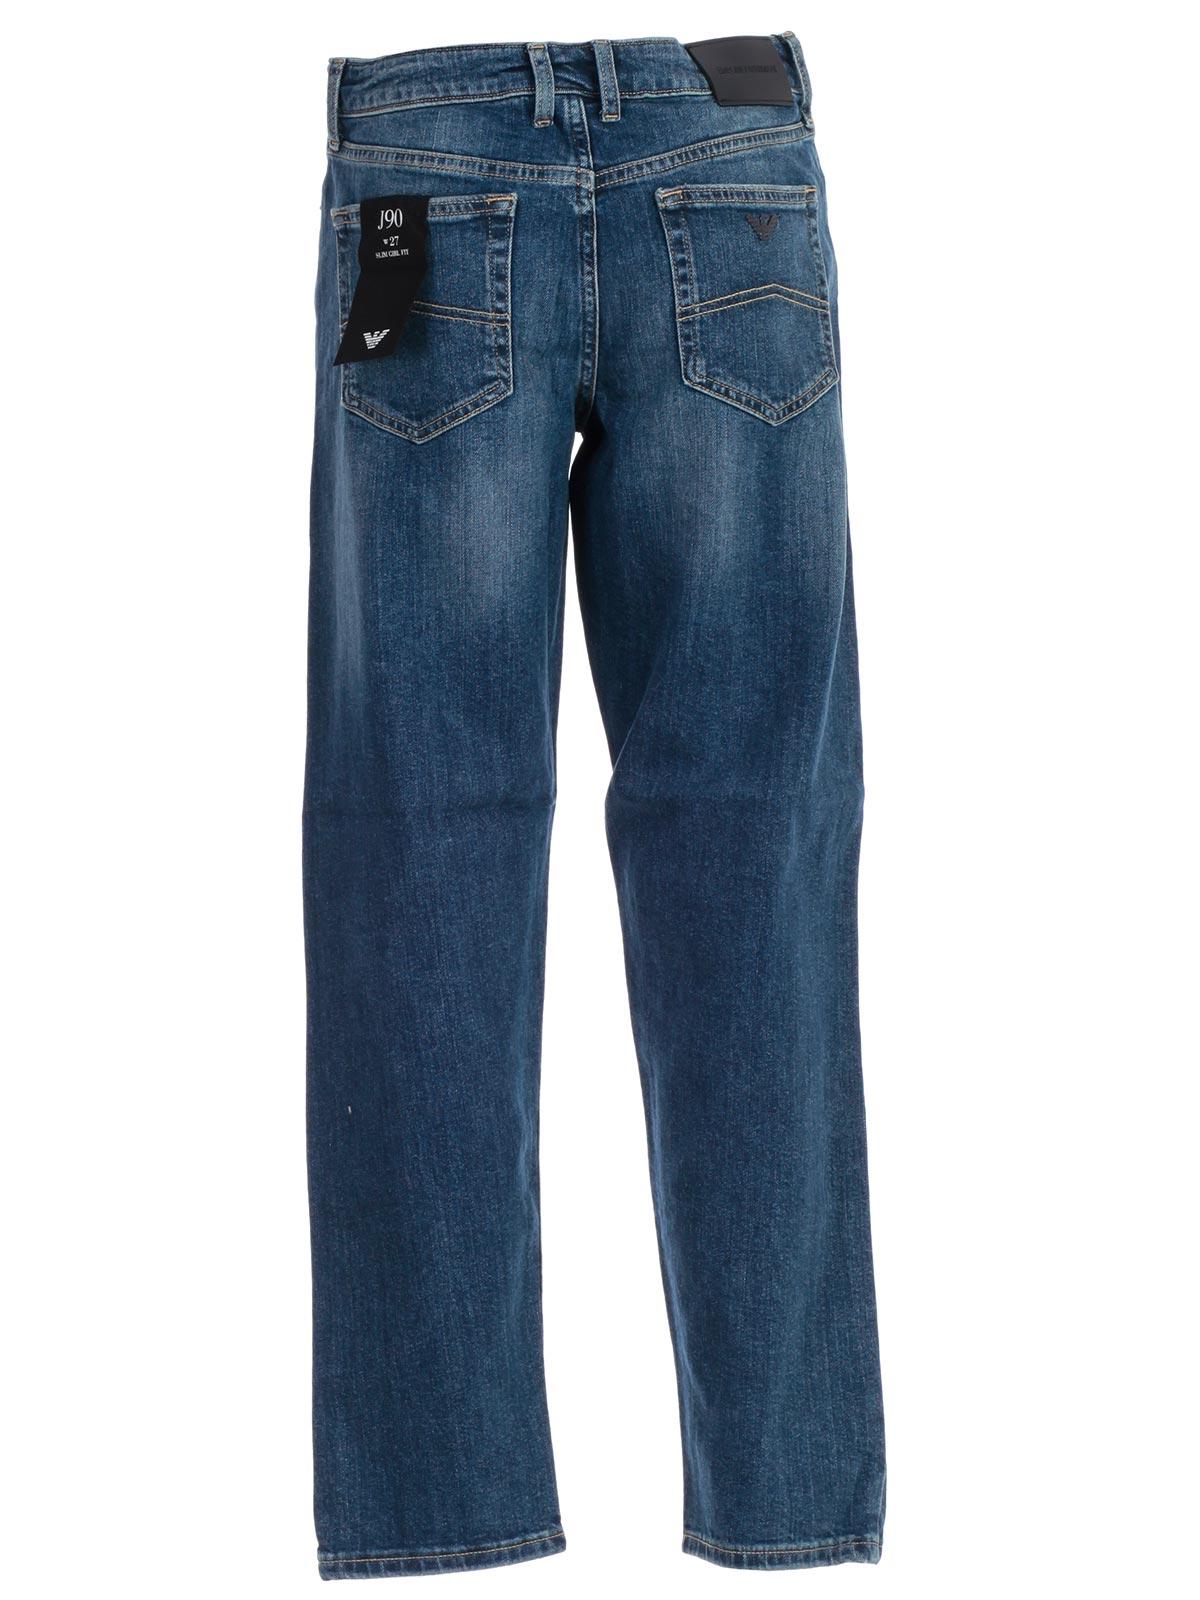 79d87fb521 Emporio Armani Jeans 3G2J90.2D5IZ - 0941 DENIM BLU.Bernardelli Store ...